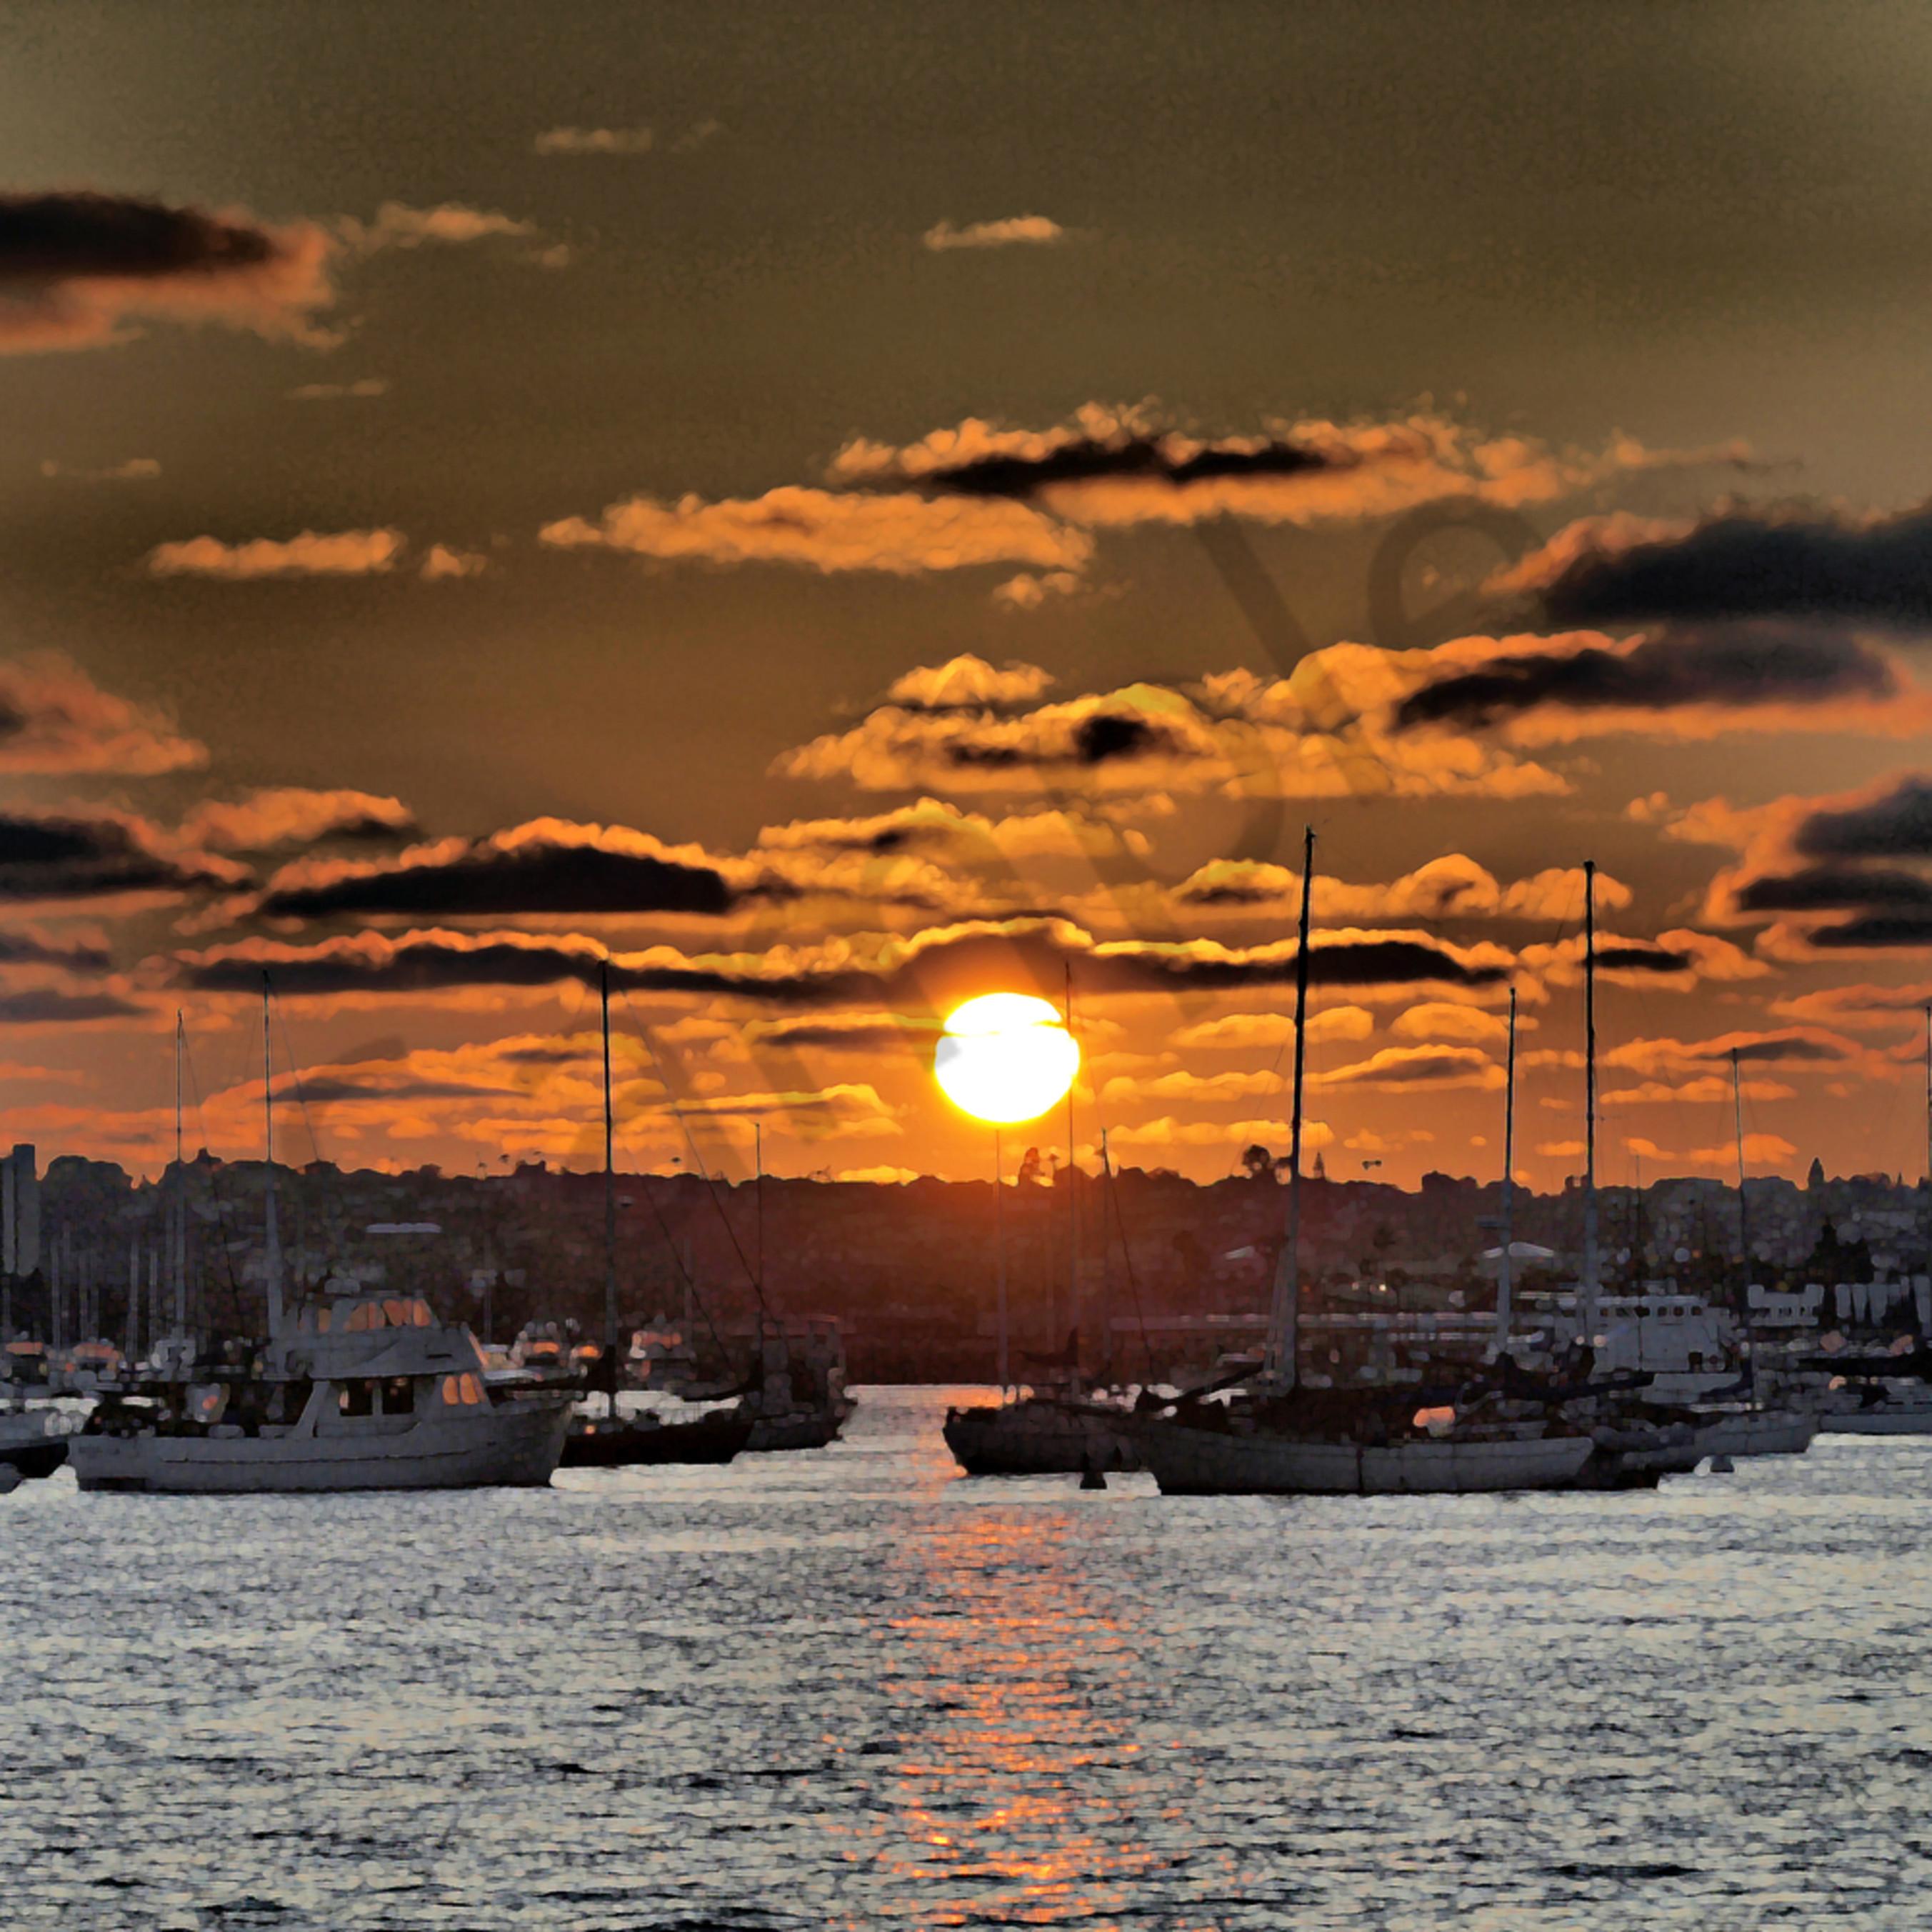 P8087022   san diego bay sunset 2 2010   clarity   ps paint daubs x8mxea